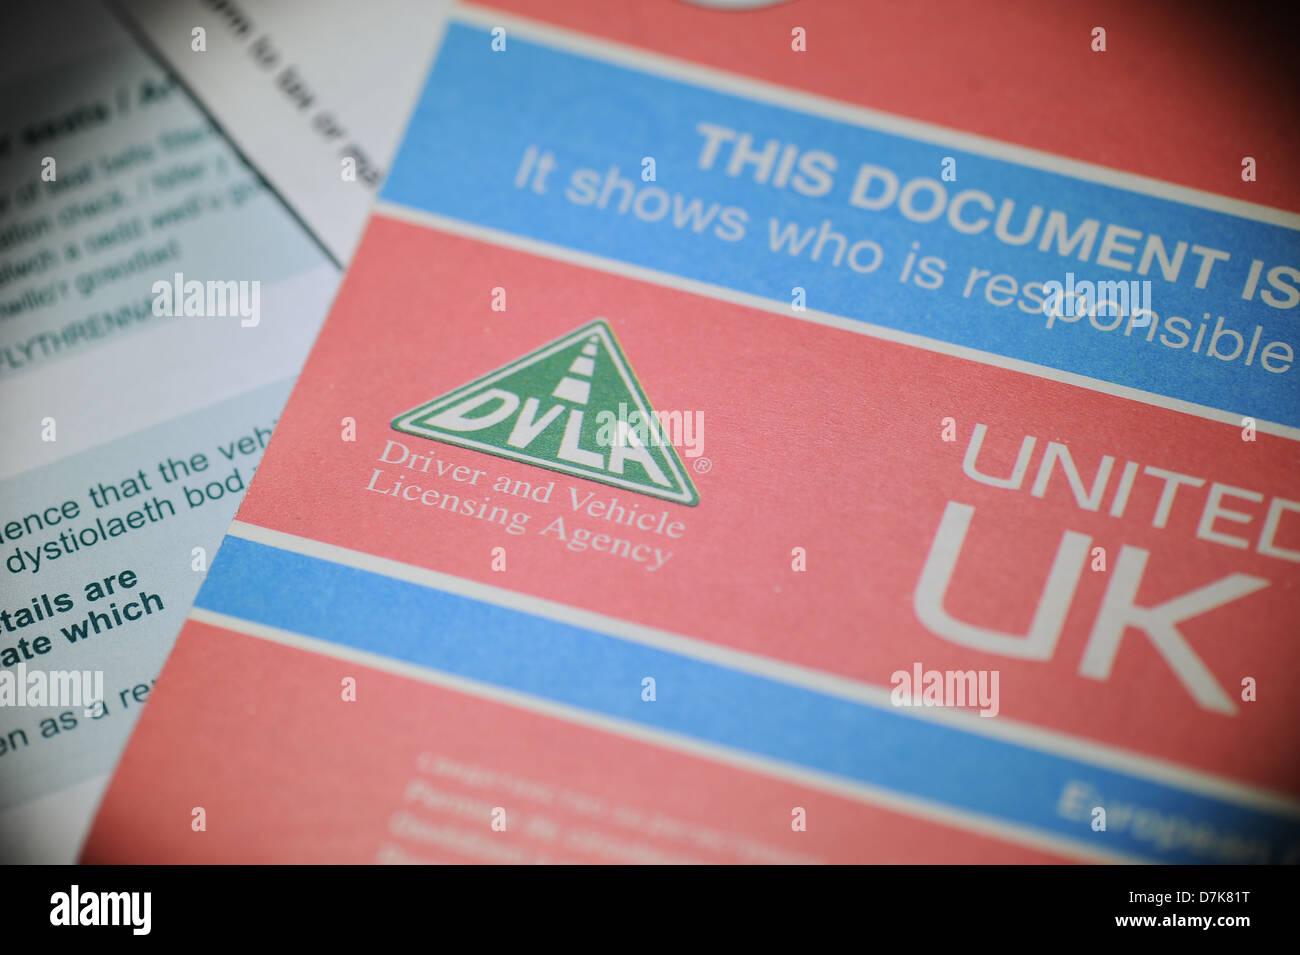 DVLA vehicle registration document - Stock Image